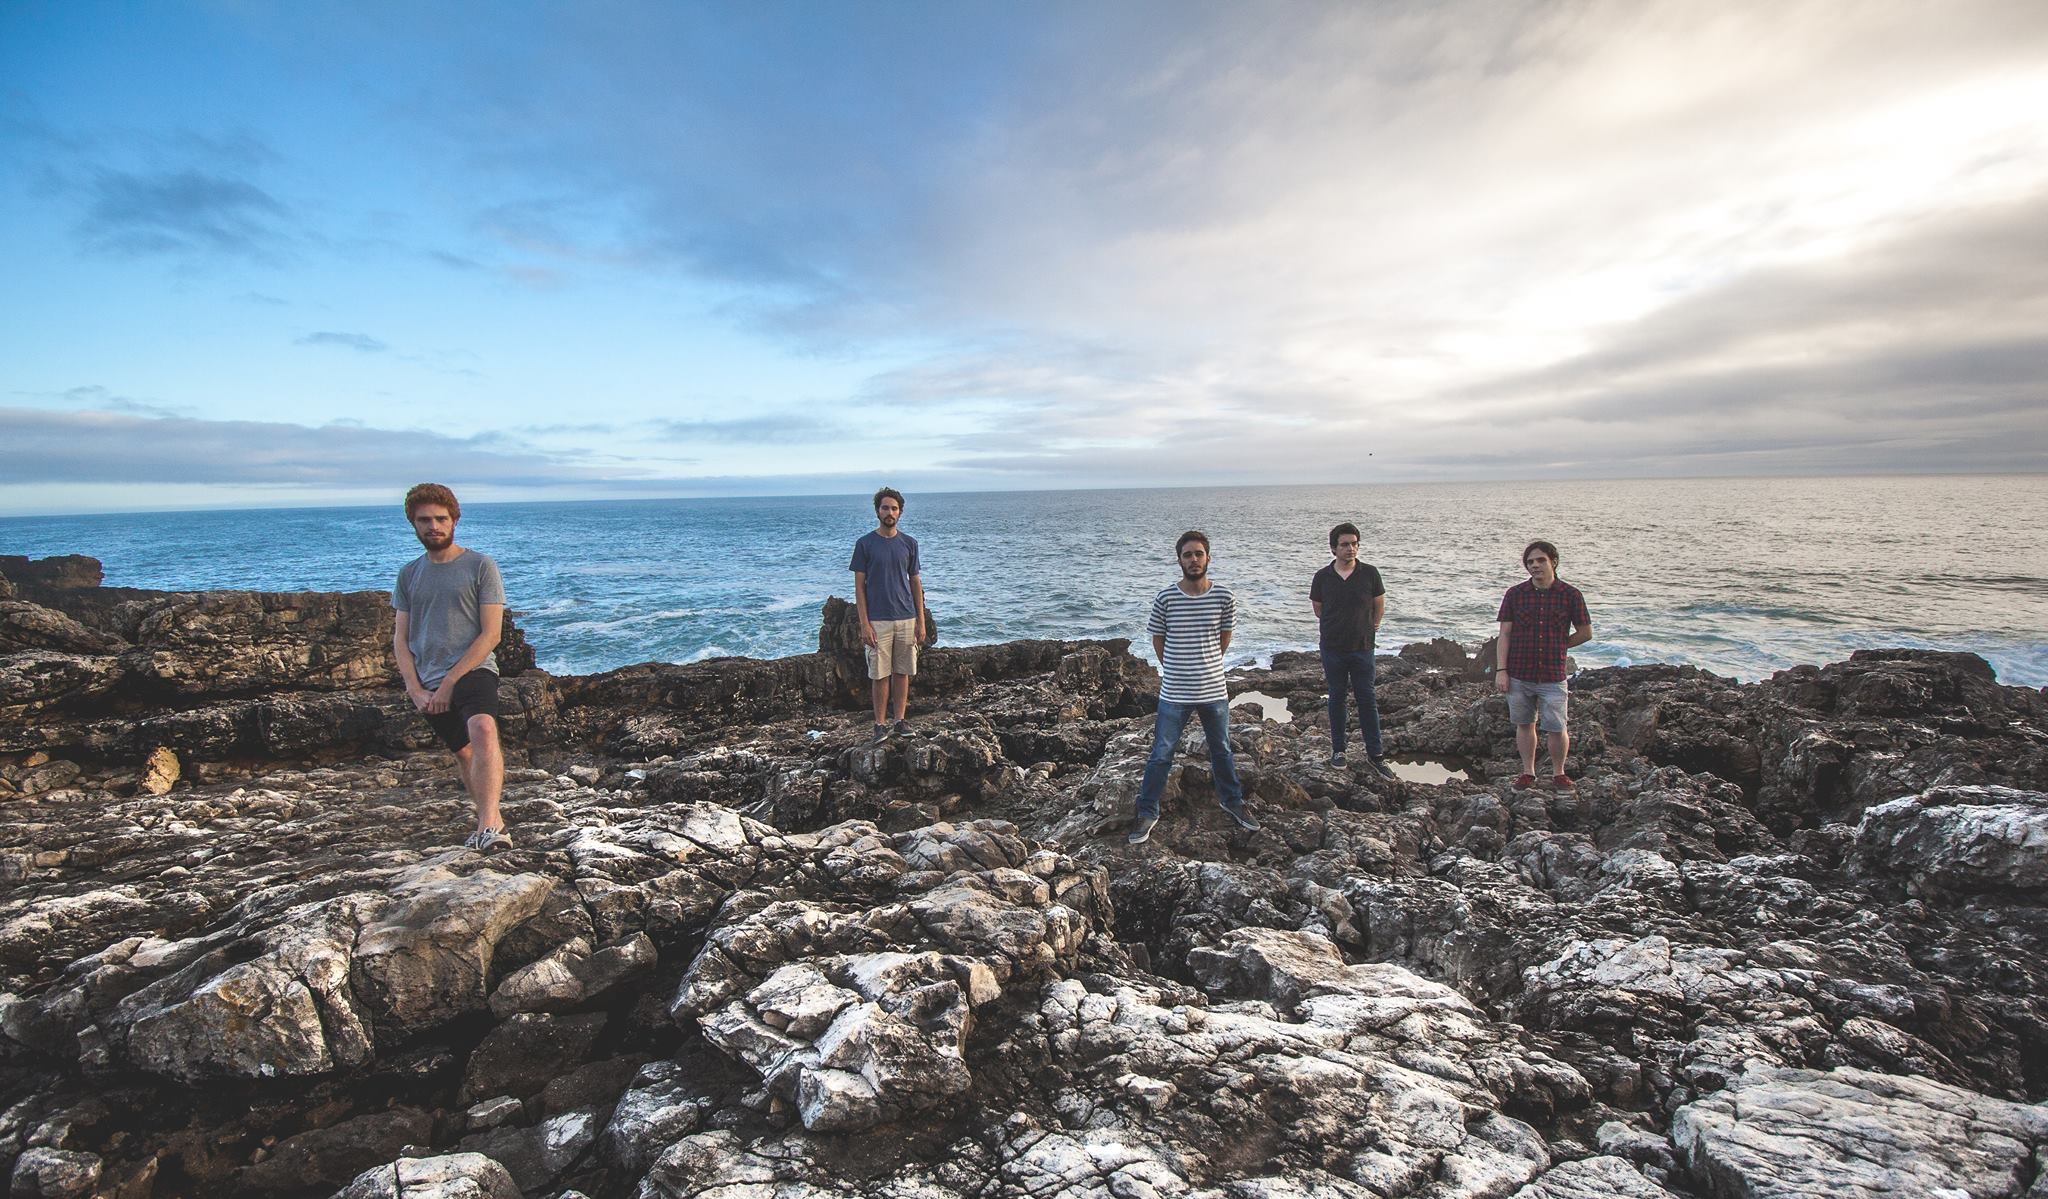 Esfera, banda de rock progressivo de Setúbal